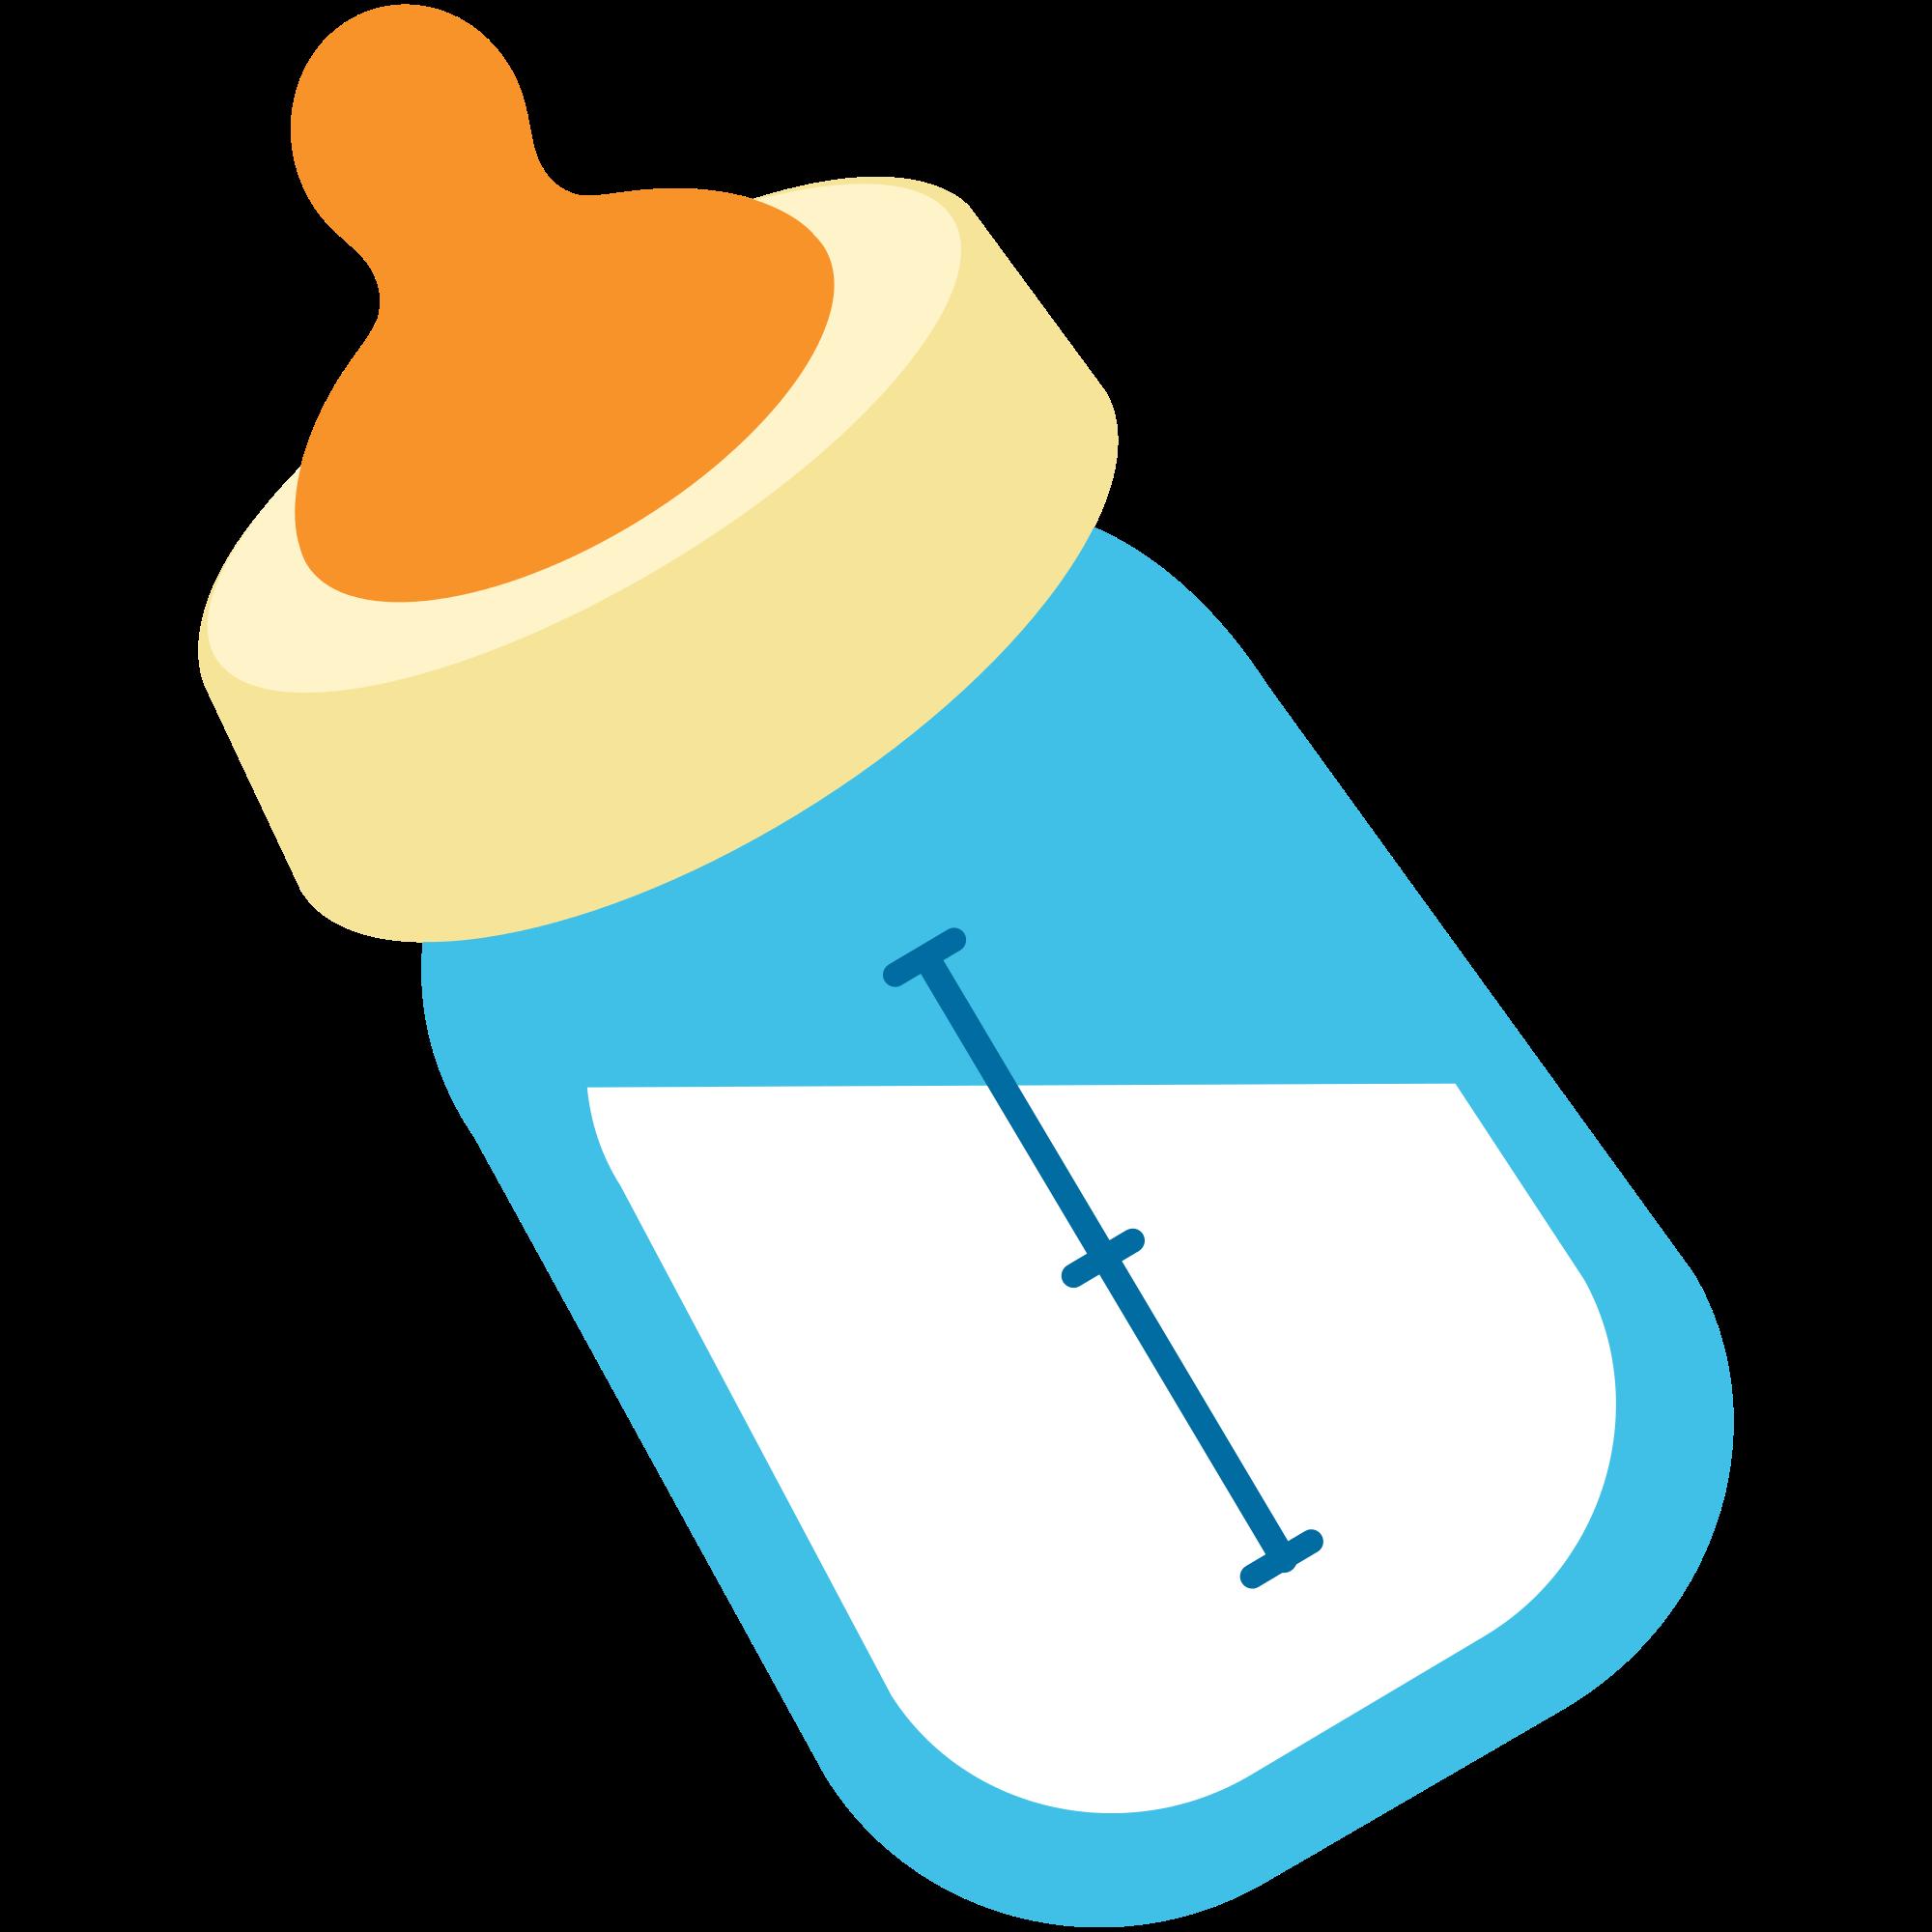 baby vector png - Buscar con Google | Baby shower ideas ...